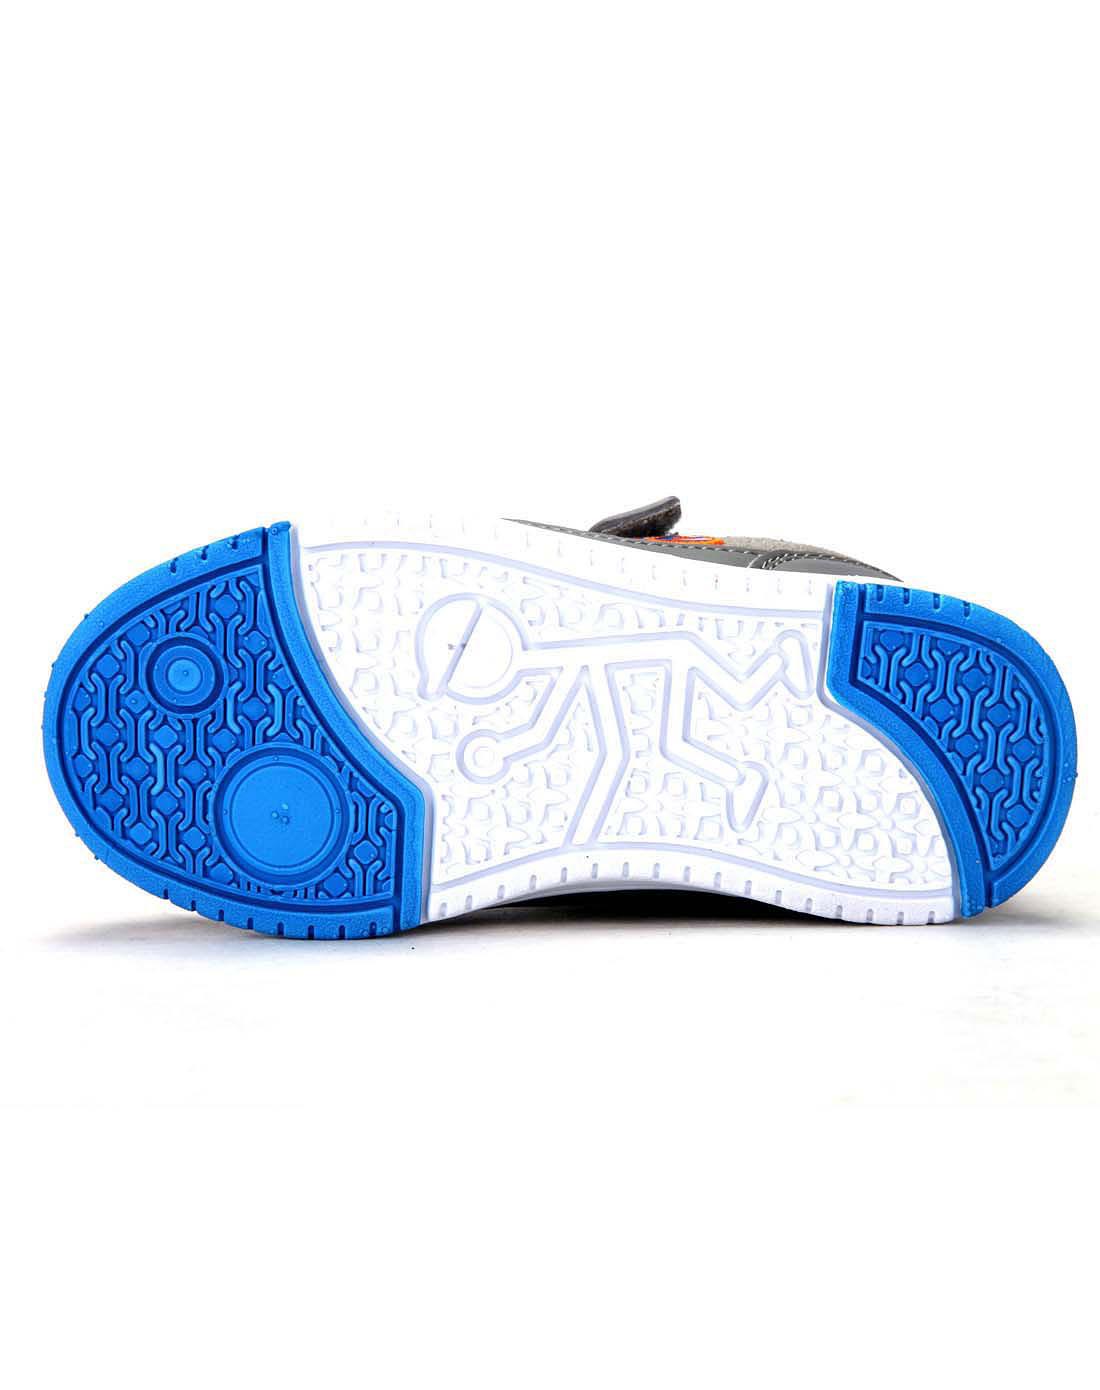 abckids男女童鞋男款小童中灰/宝蓝运动鞋y2322215d